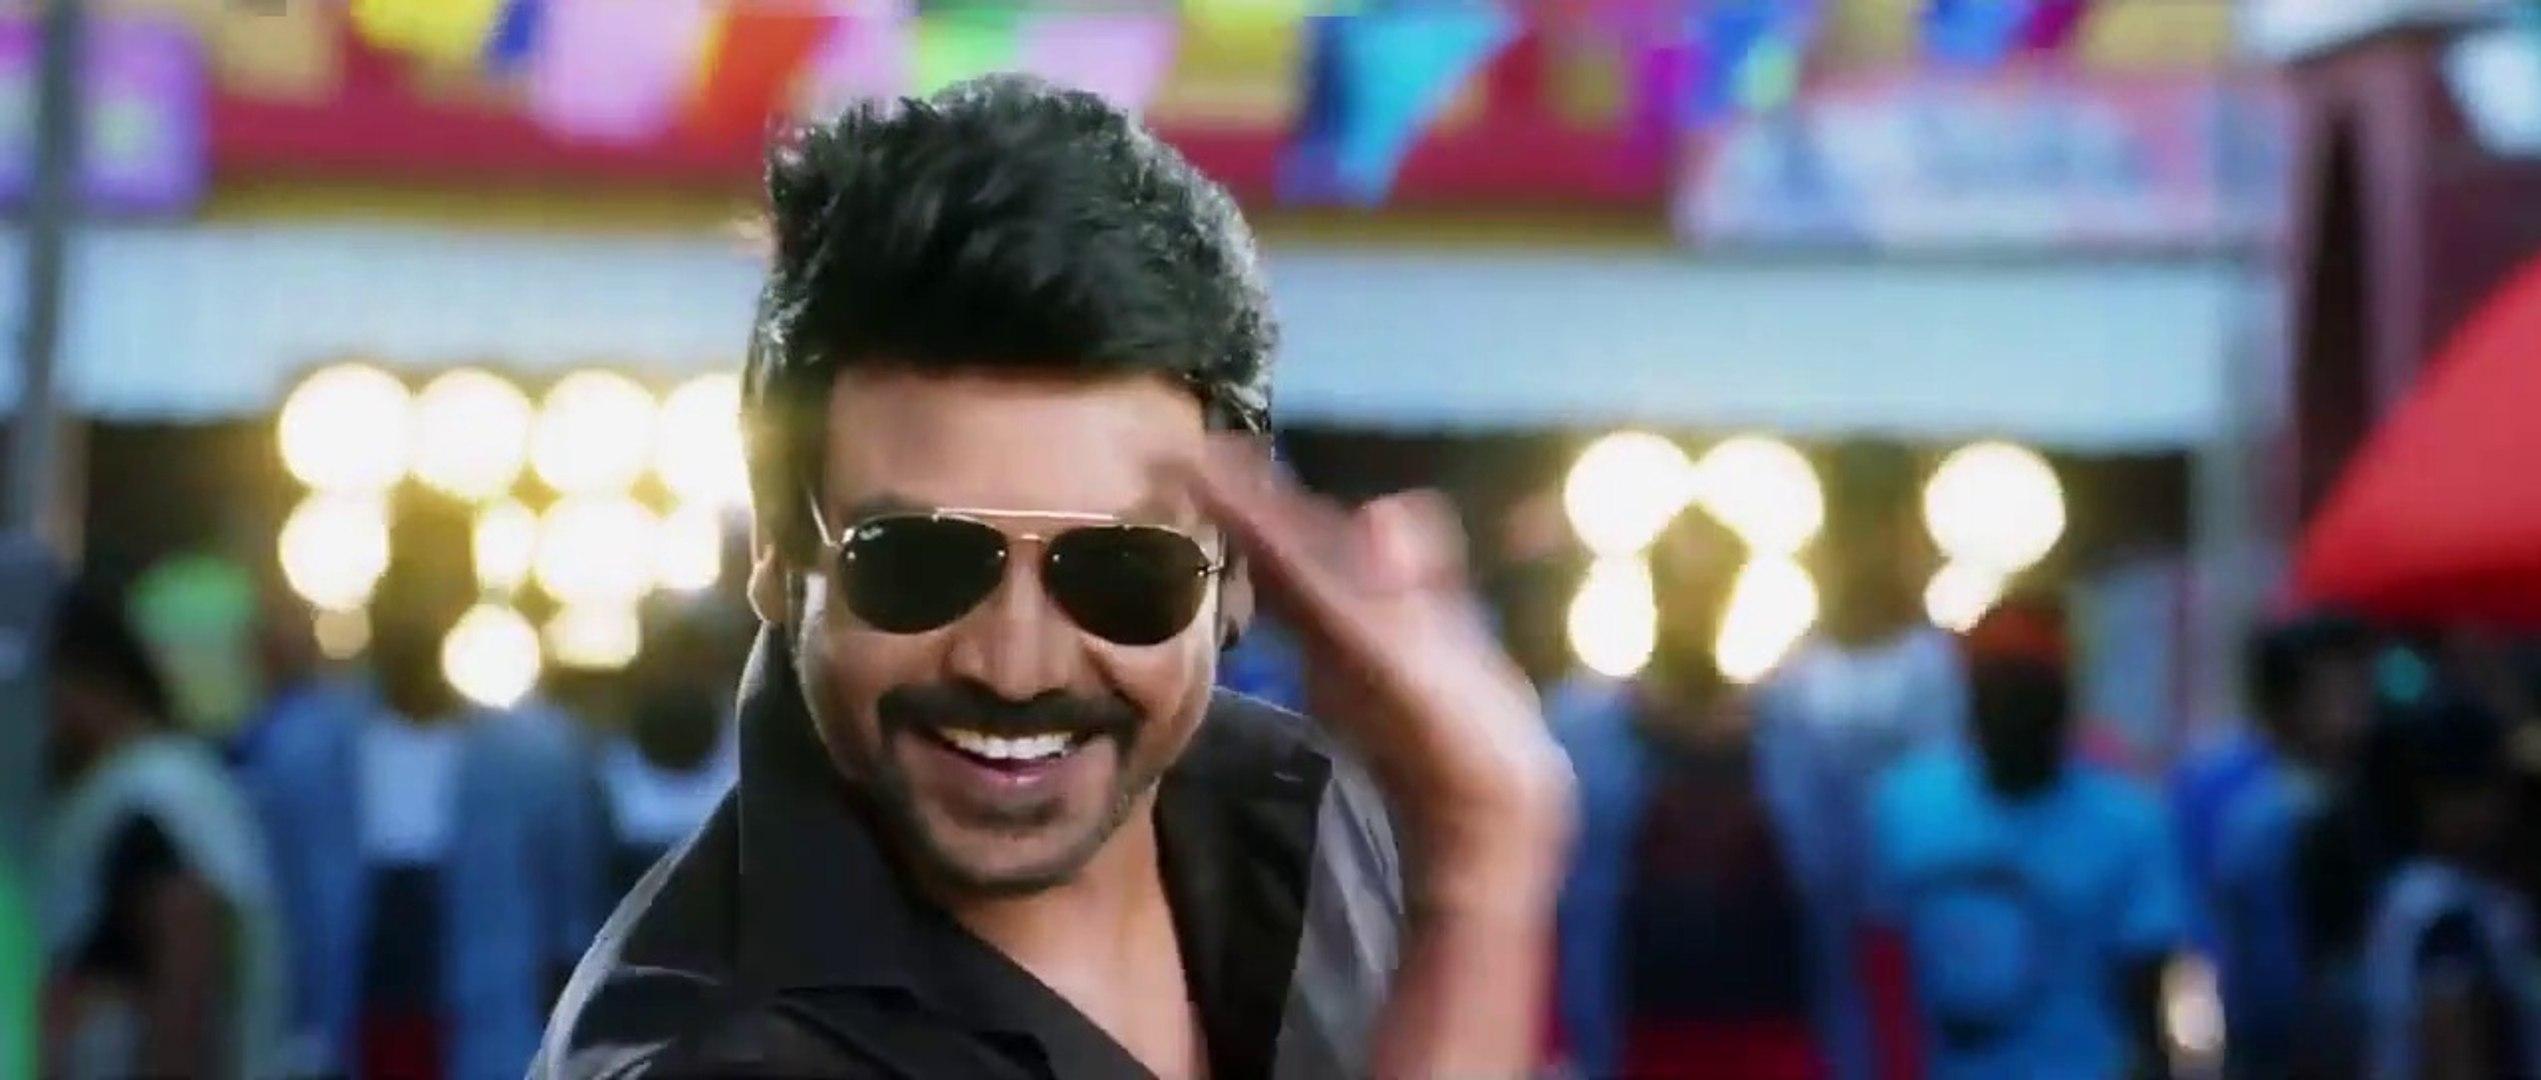 Nanbanuku Kovila Kattu Song Kanchana 3 Hd Tamil Video Dailymotion